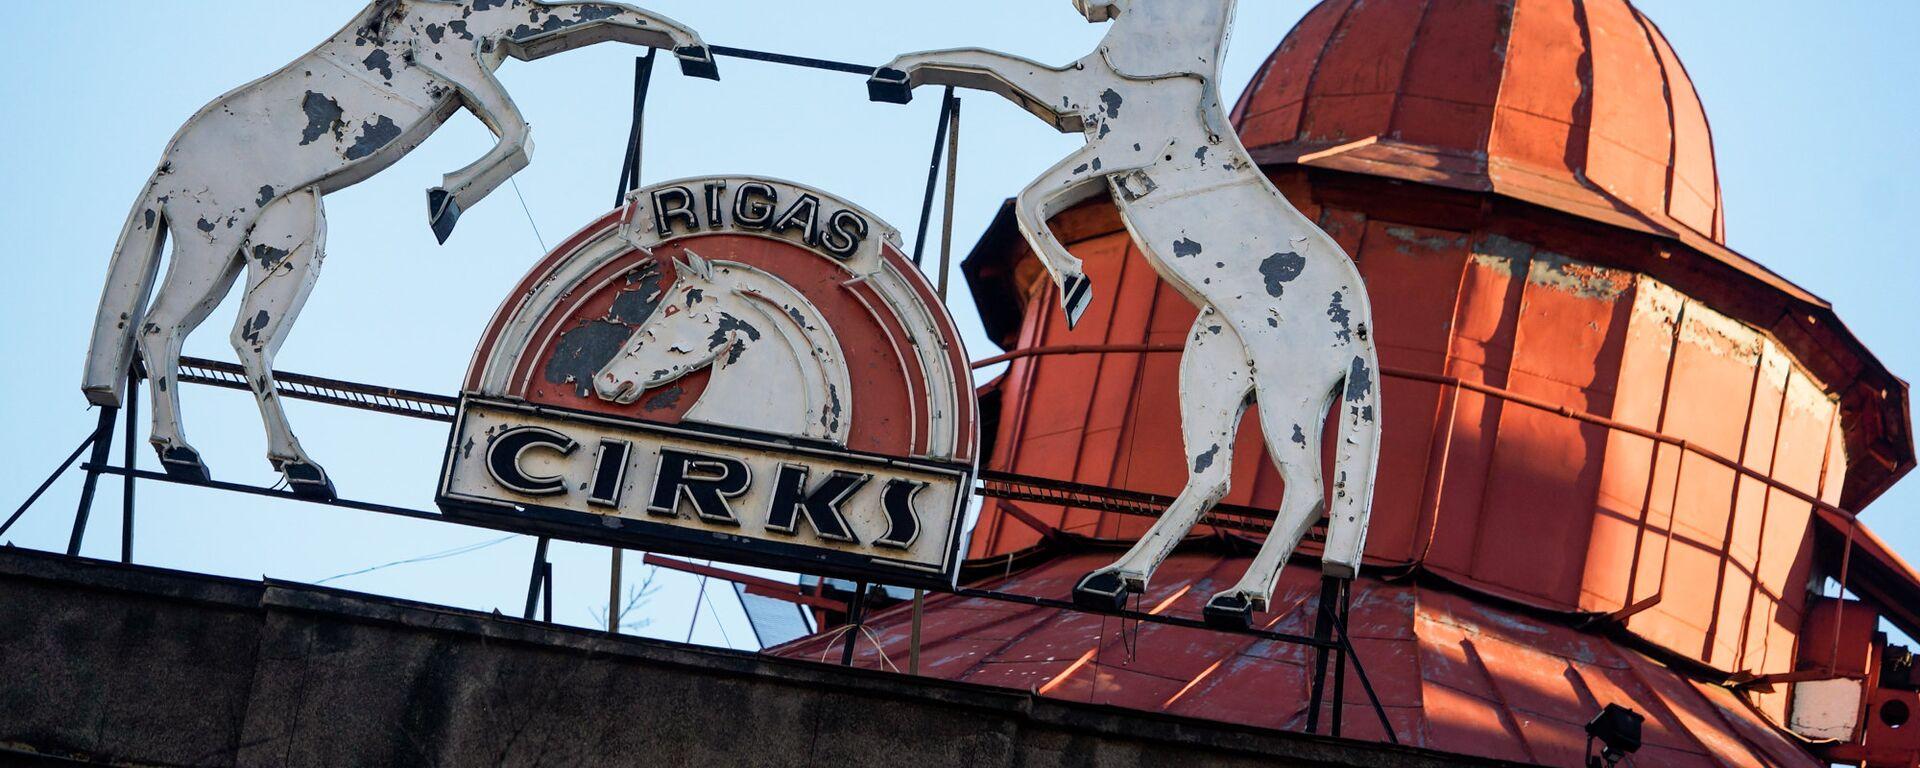 Рижский цирк, фасад - Sputnik Латвия, 1920, 17.05.2021